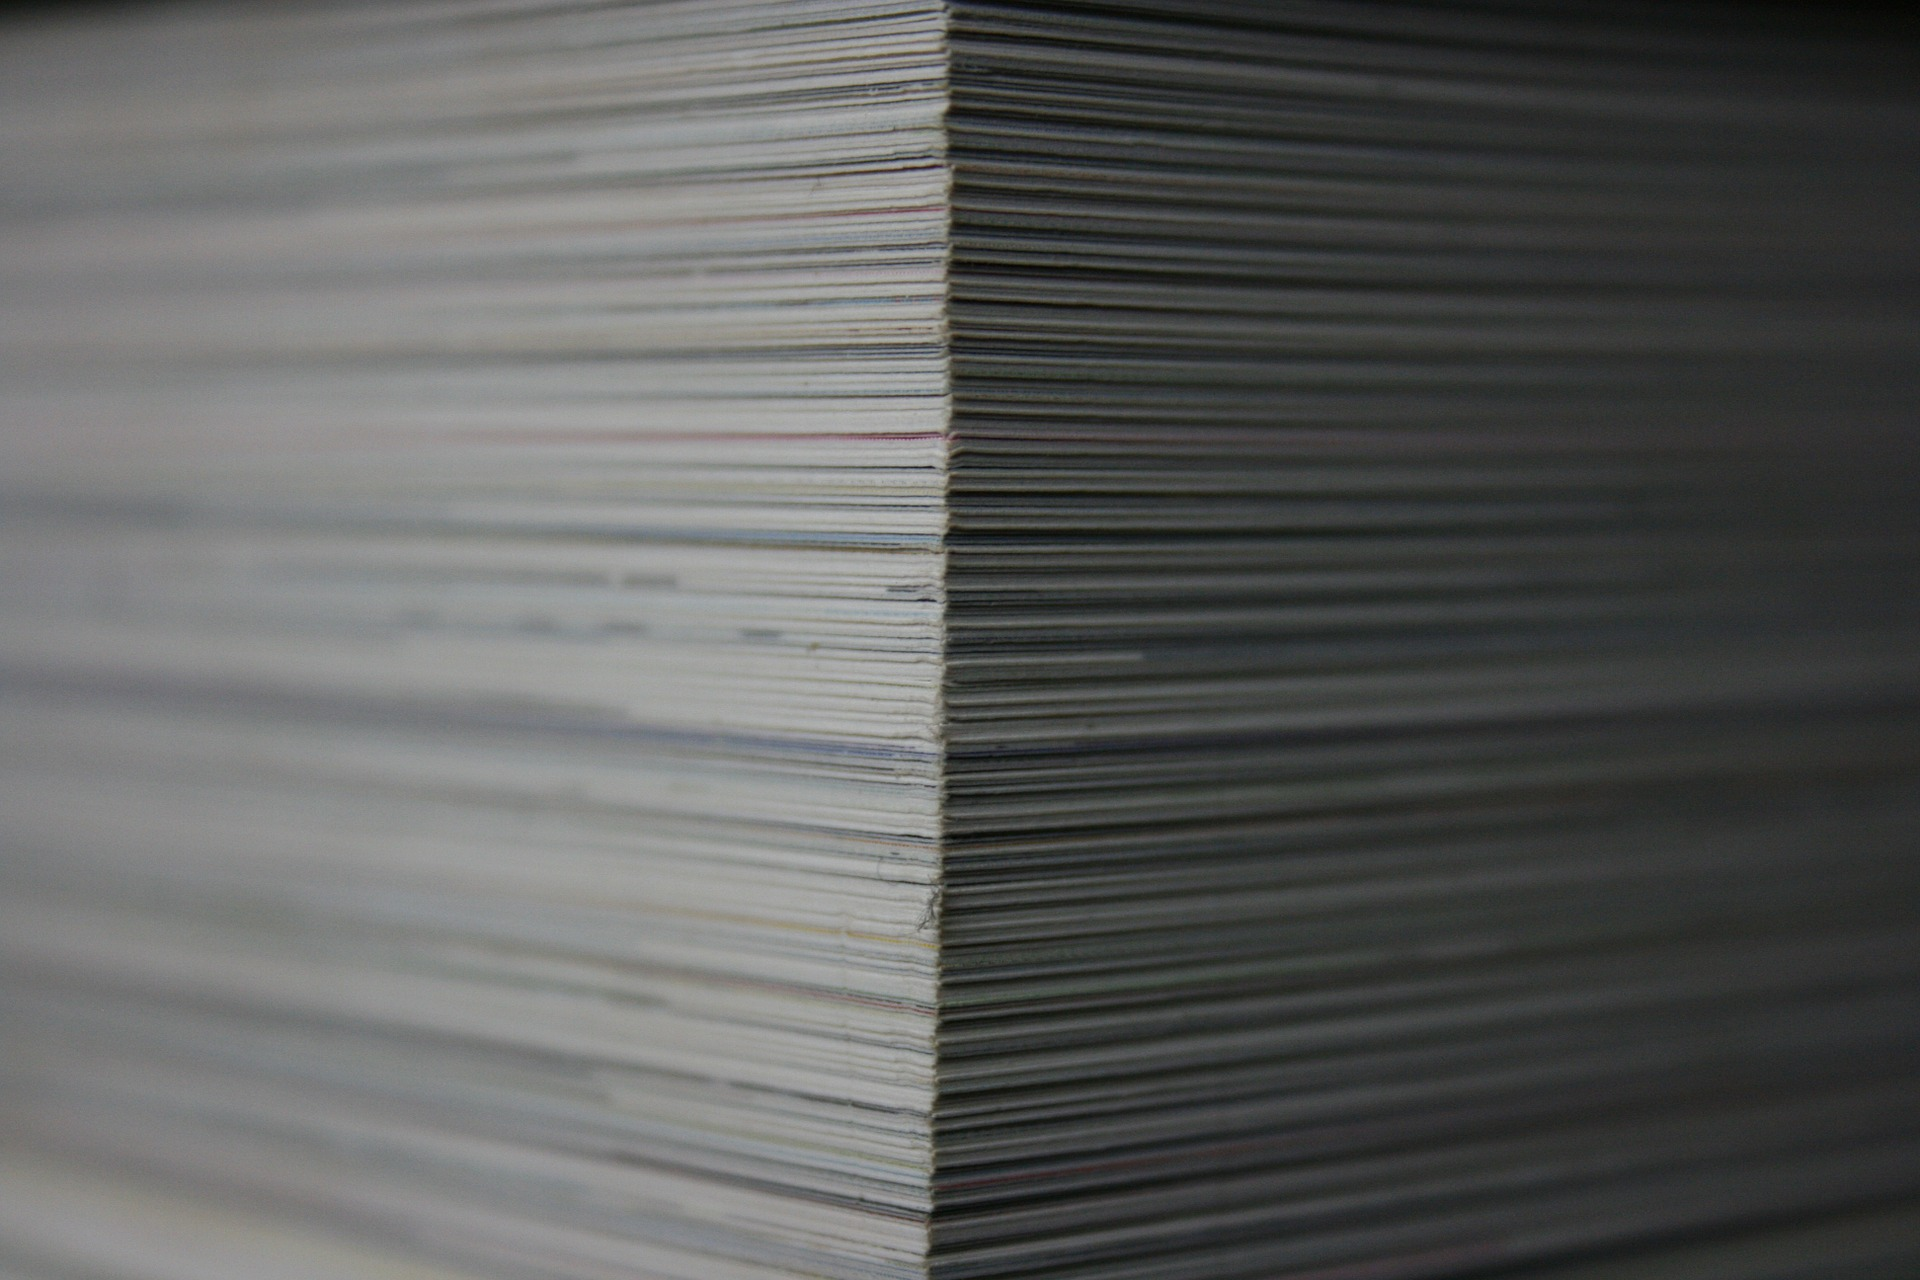 paper-1328856_1920